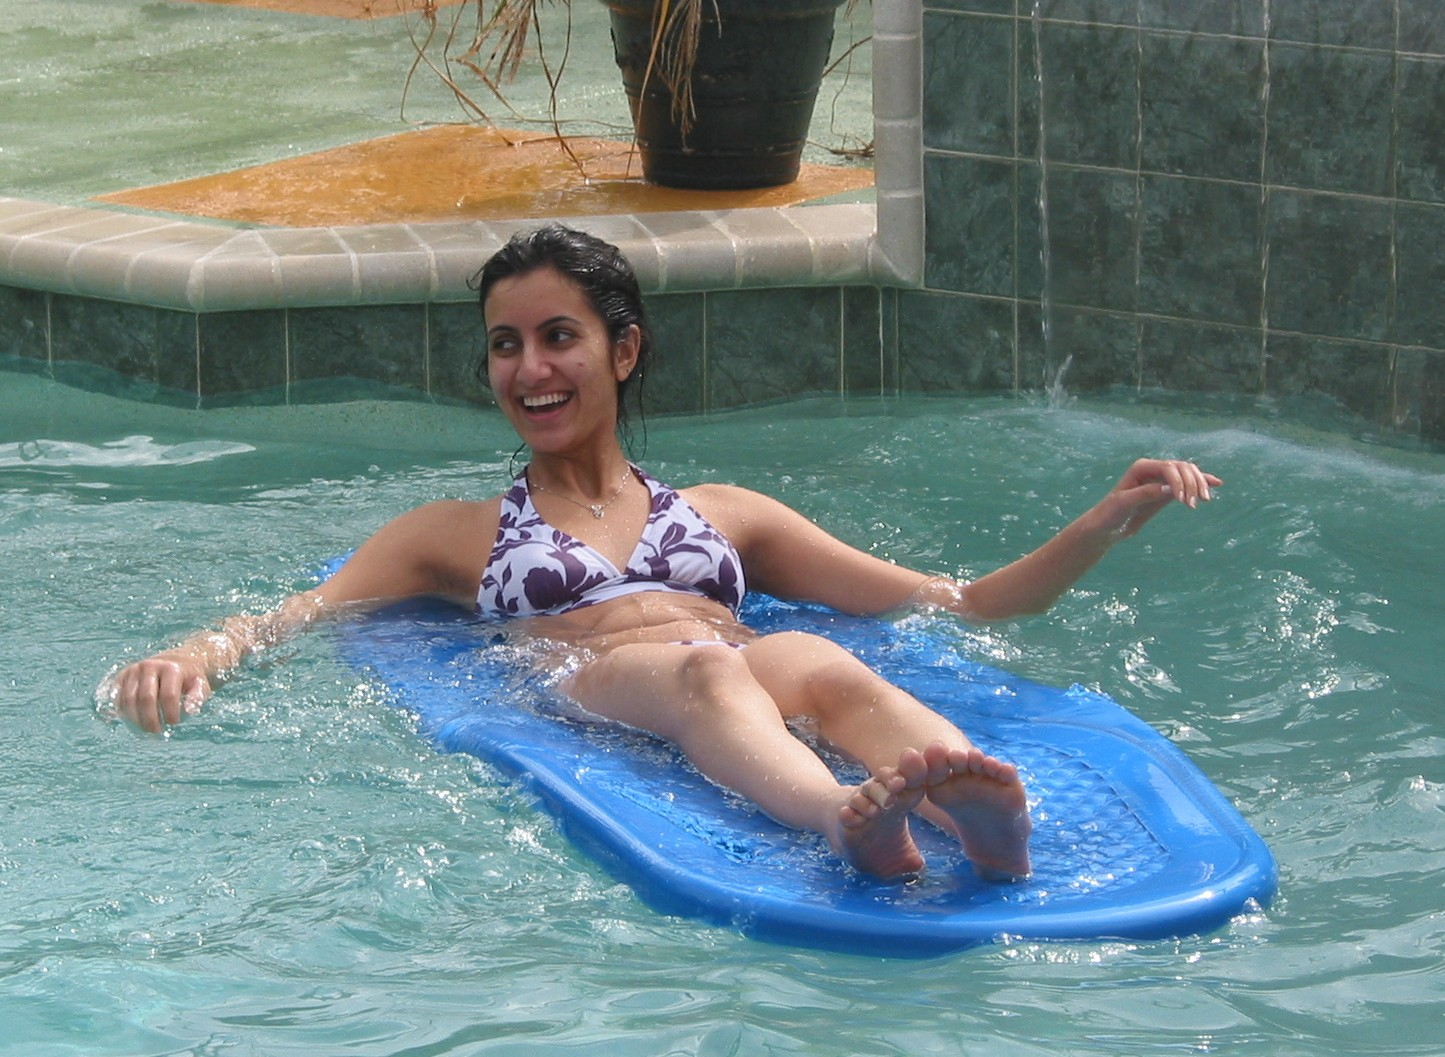 Bikini Girls At Water Parks